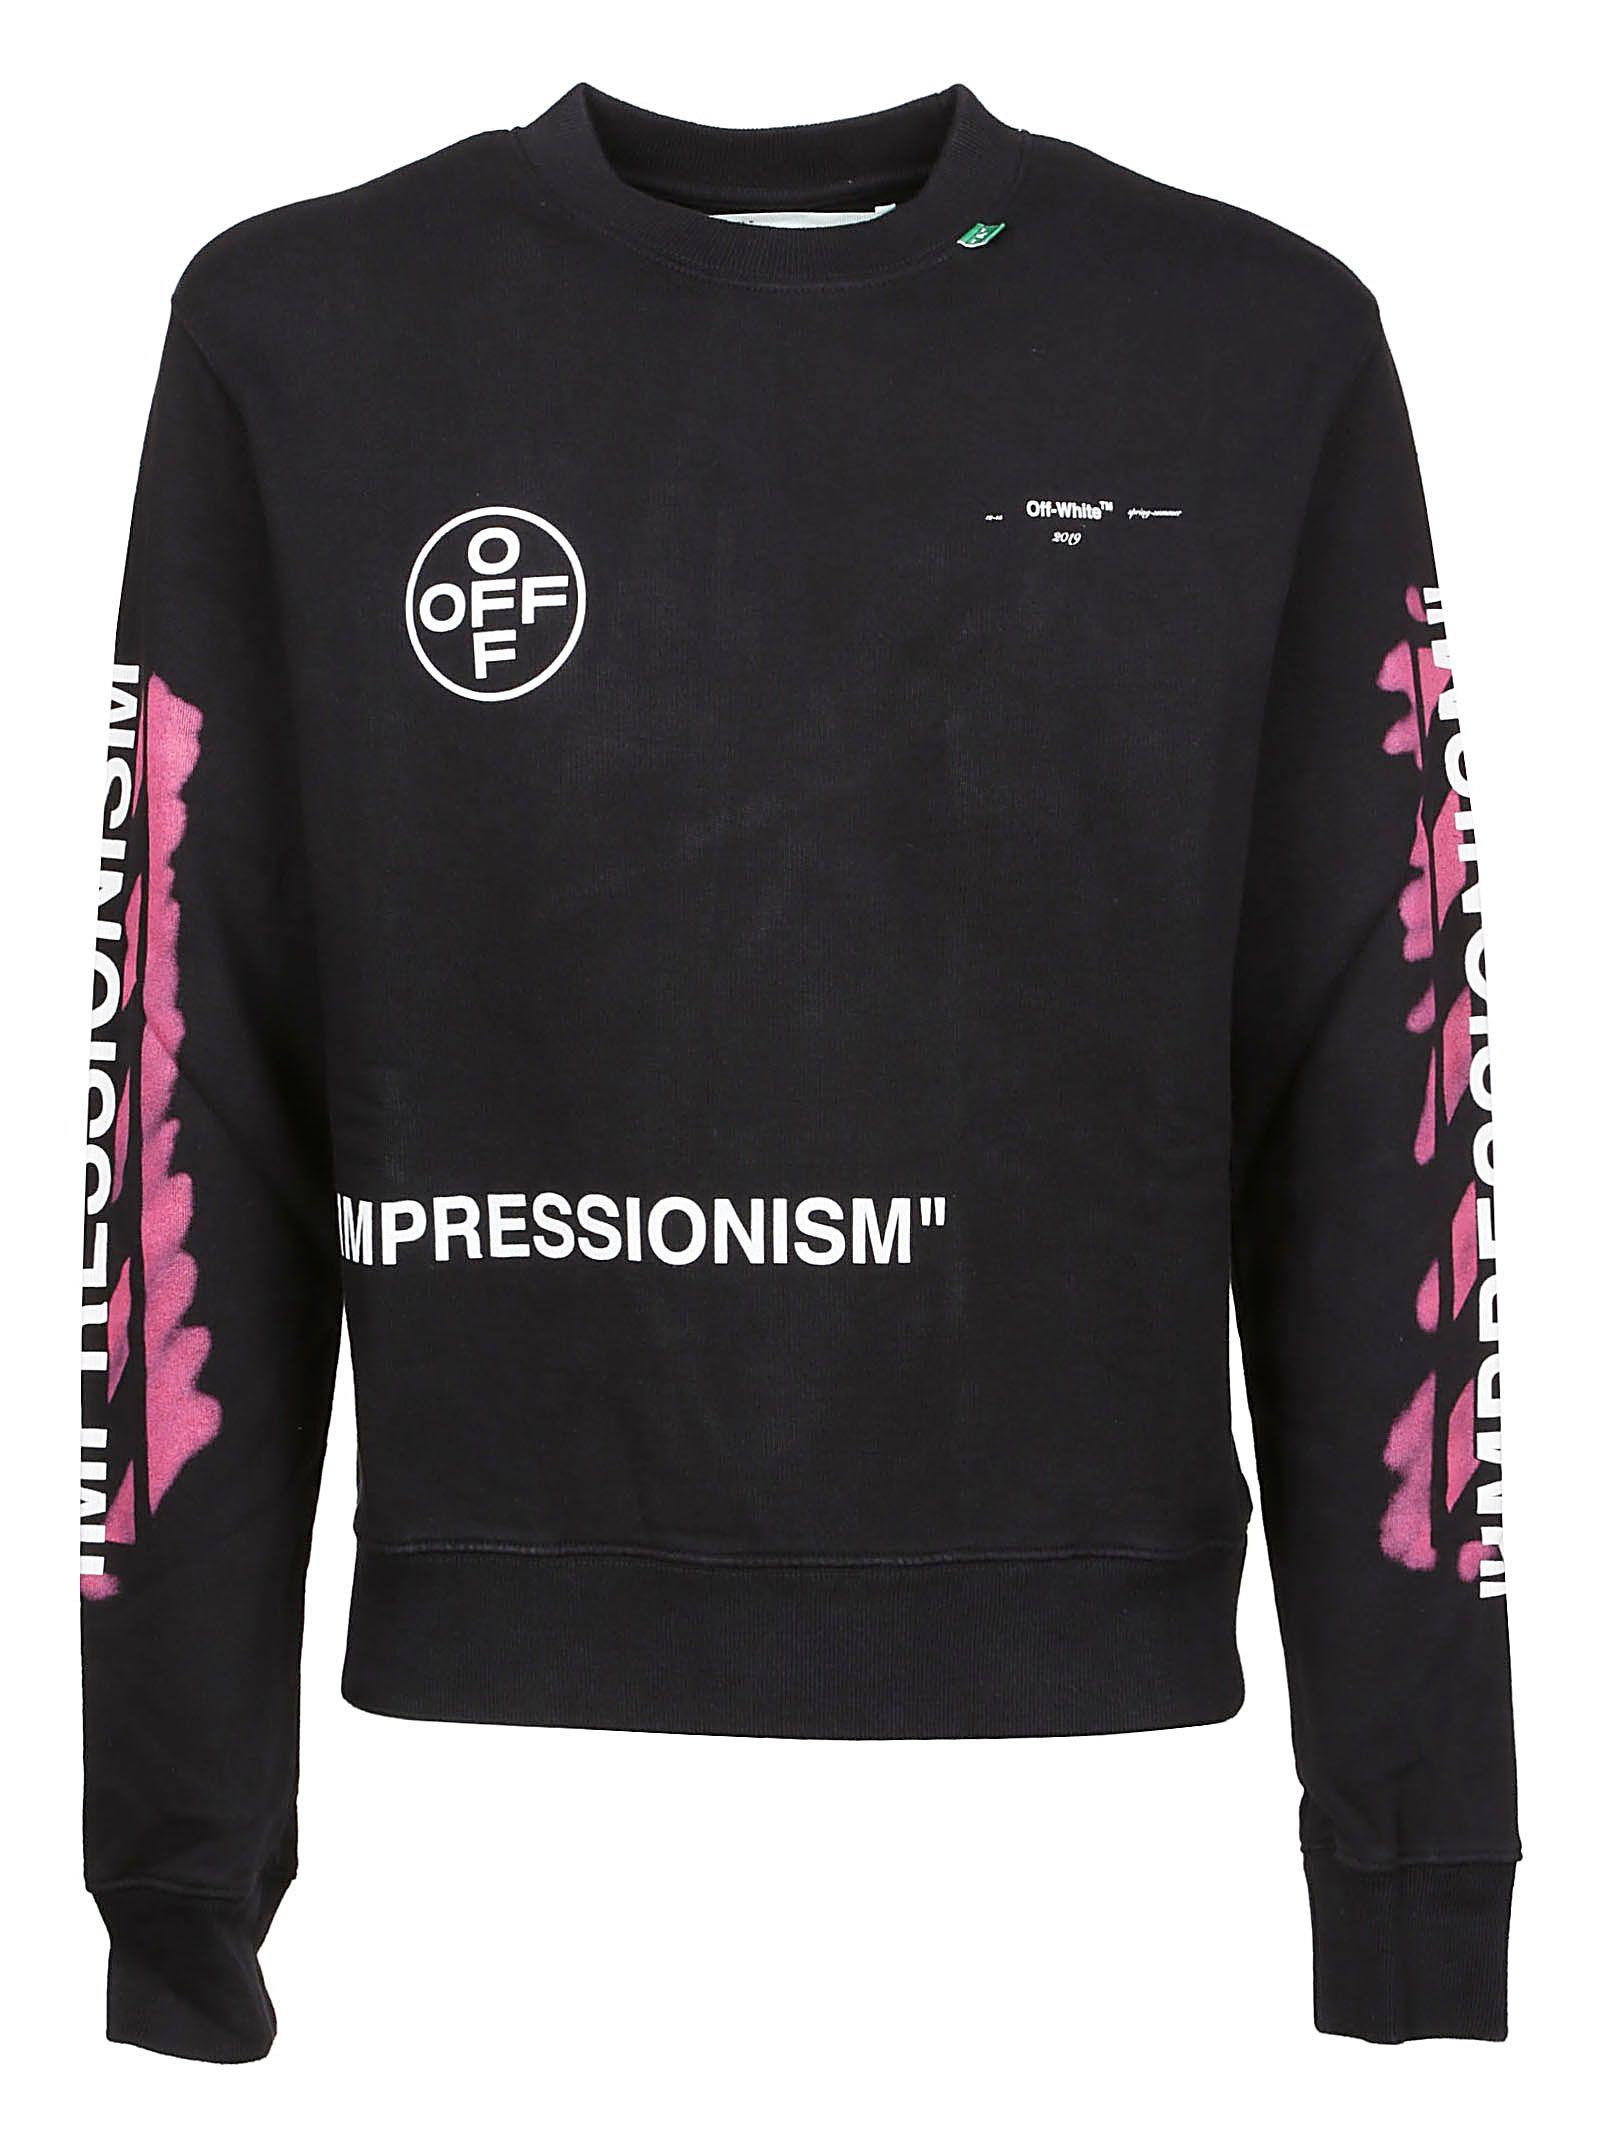 Think Outside The Box Mens Premium T-Shirt Funny Slogan